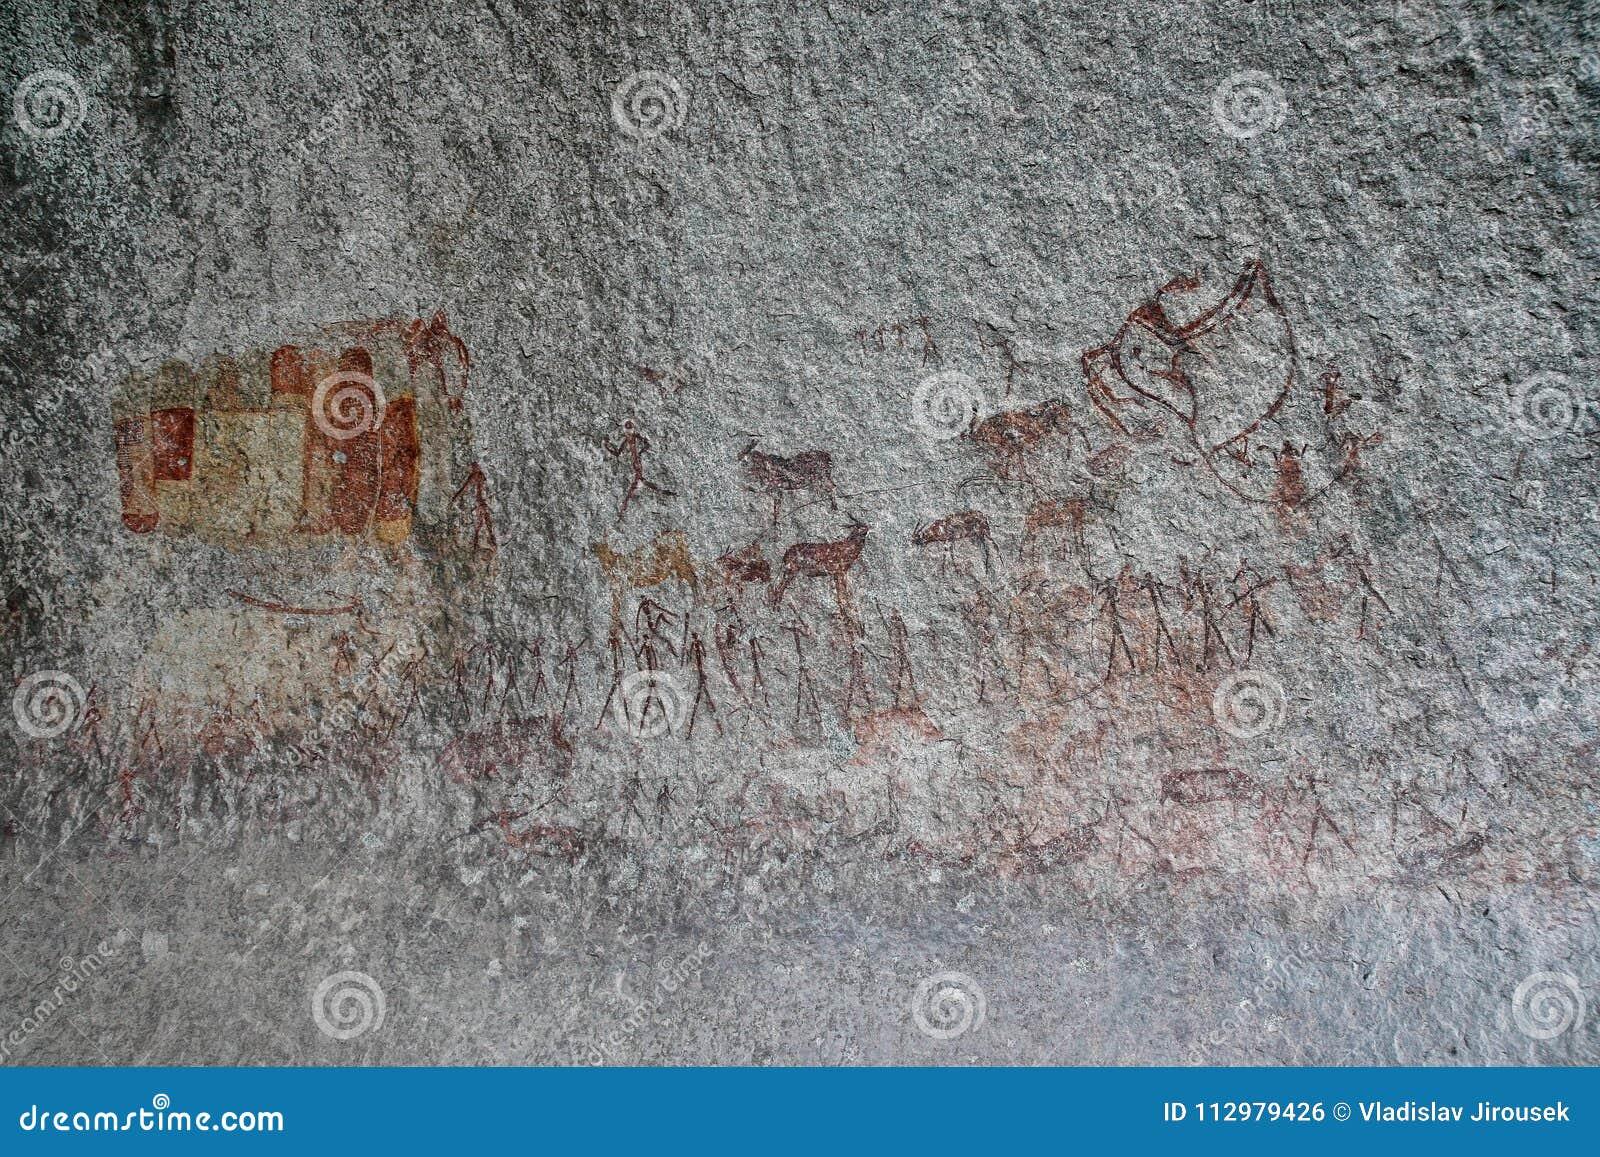 Bushmen rock painting of human figures and antelopes, giraffe of the Matopos National Park, Zimbabwe